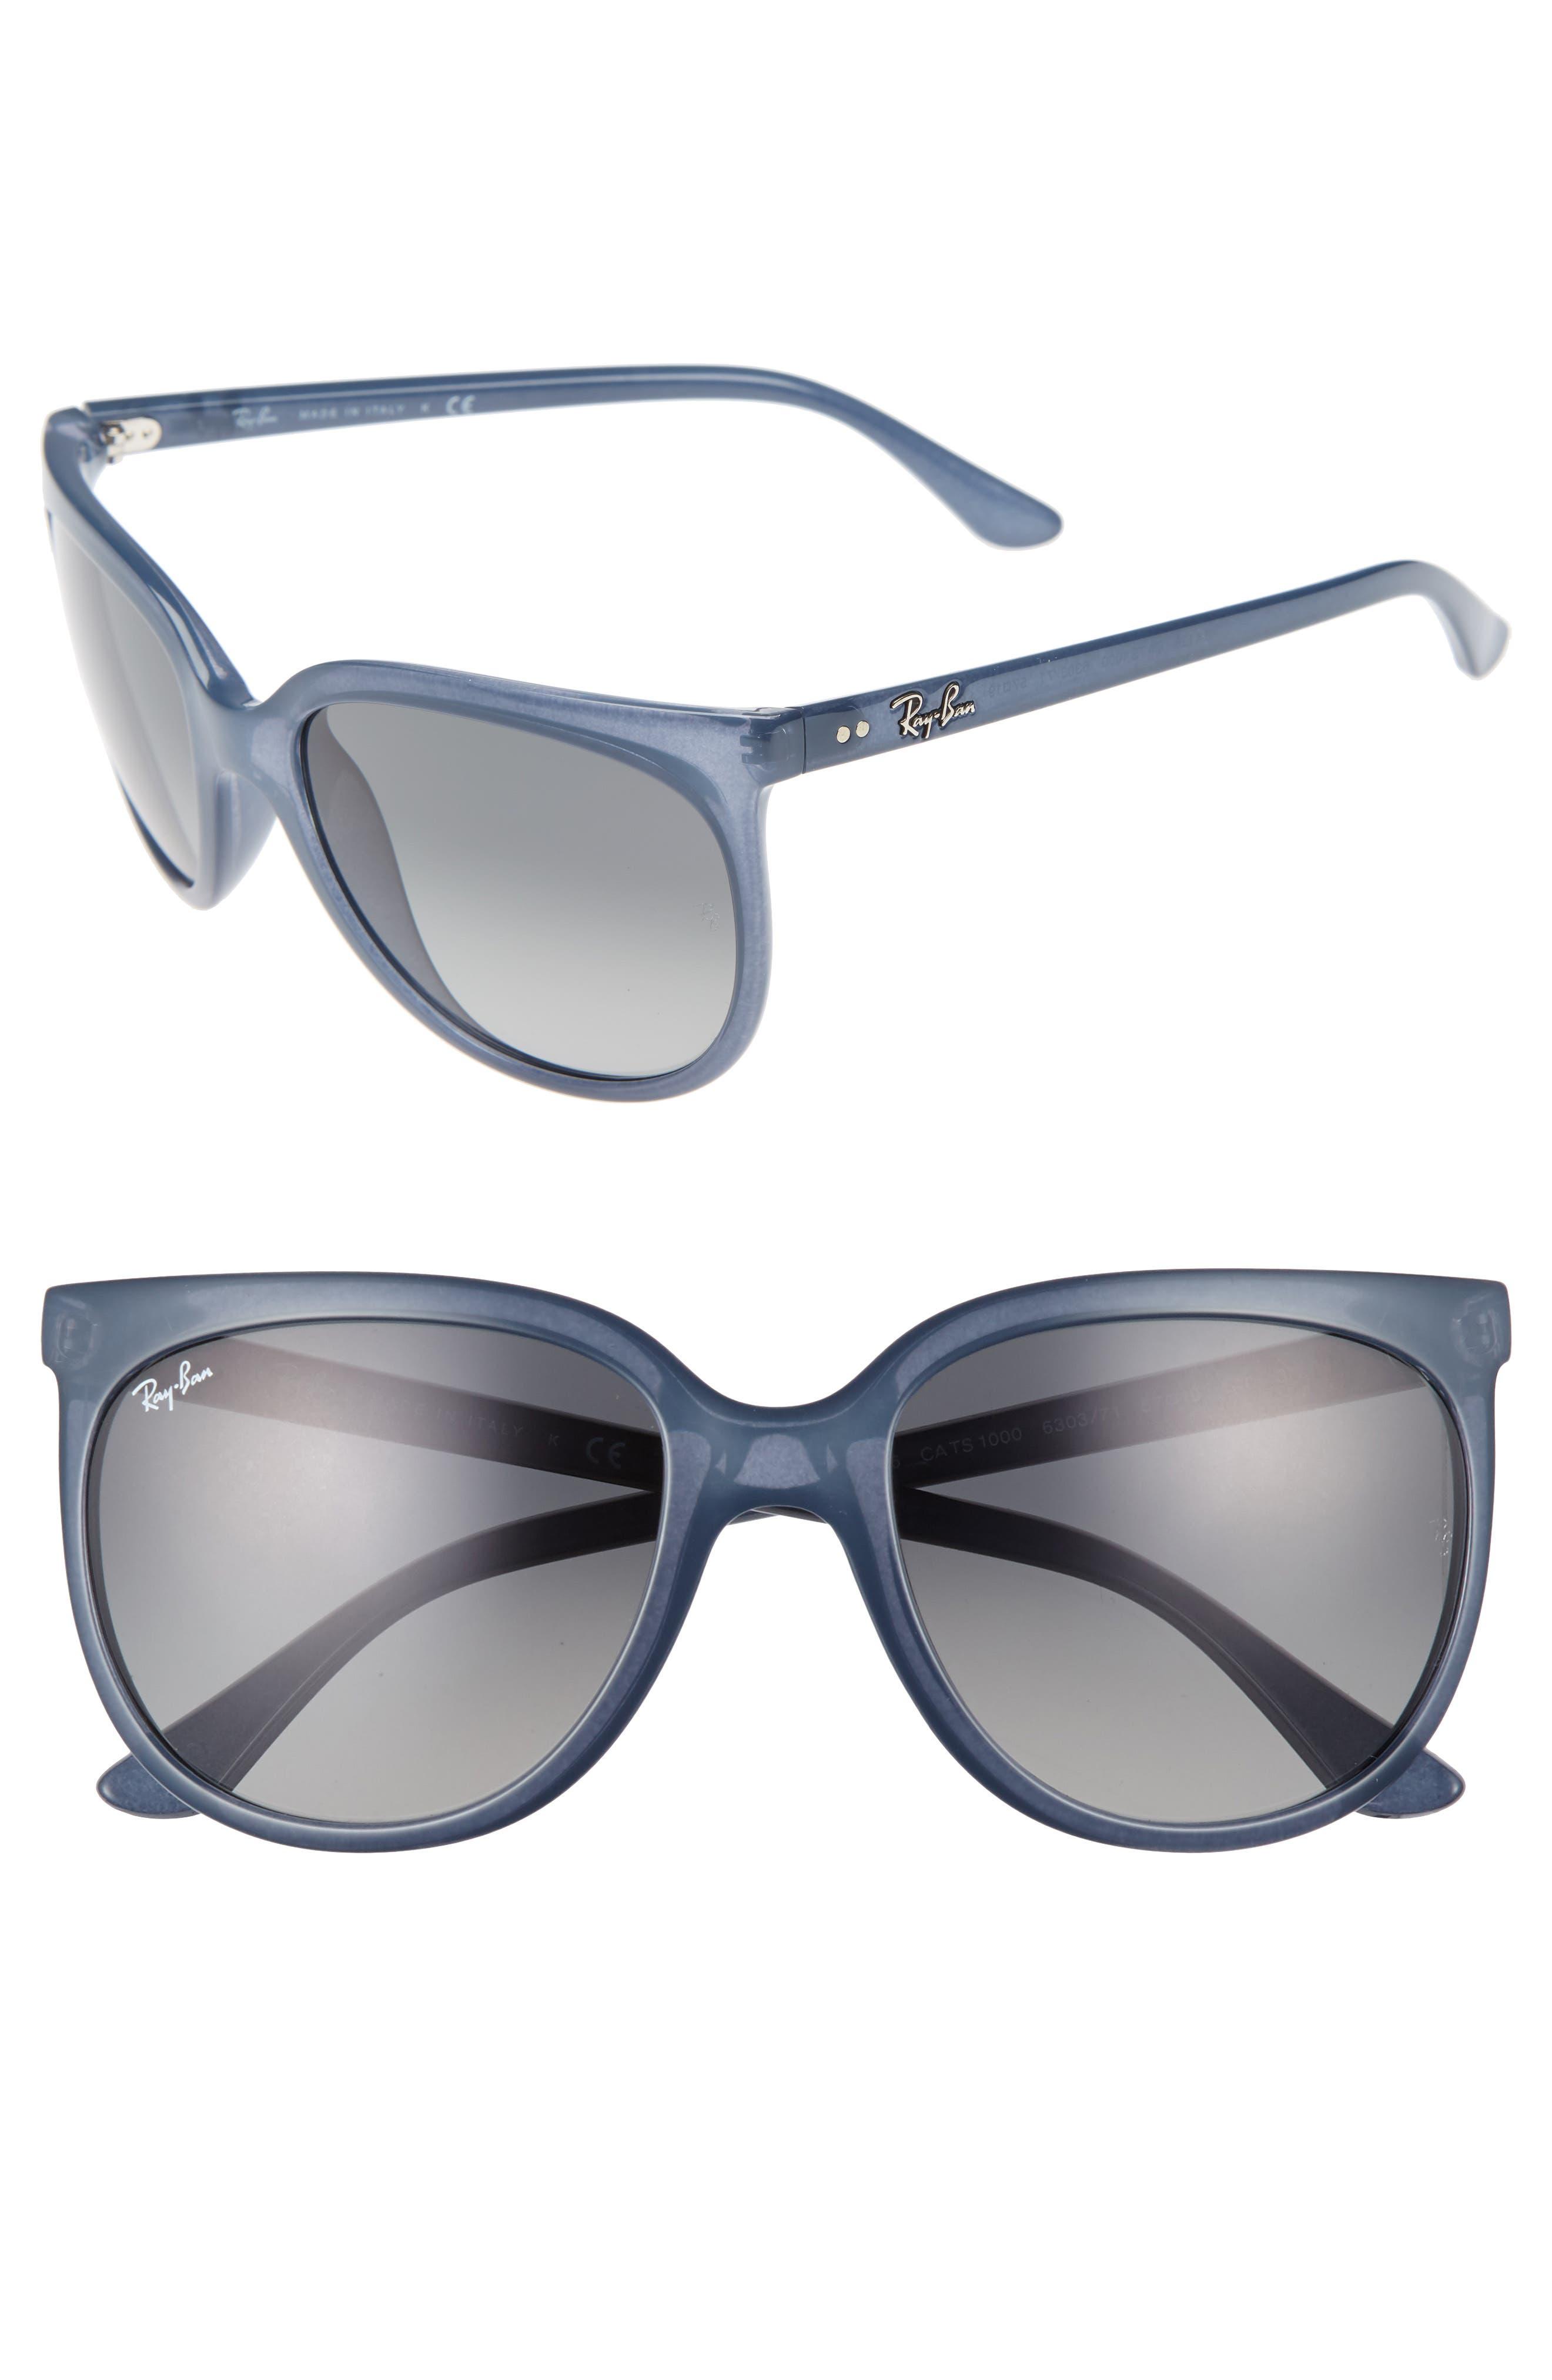 Ray-Ban Retro Cat Eye Sunglasses